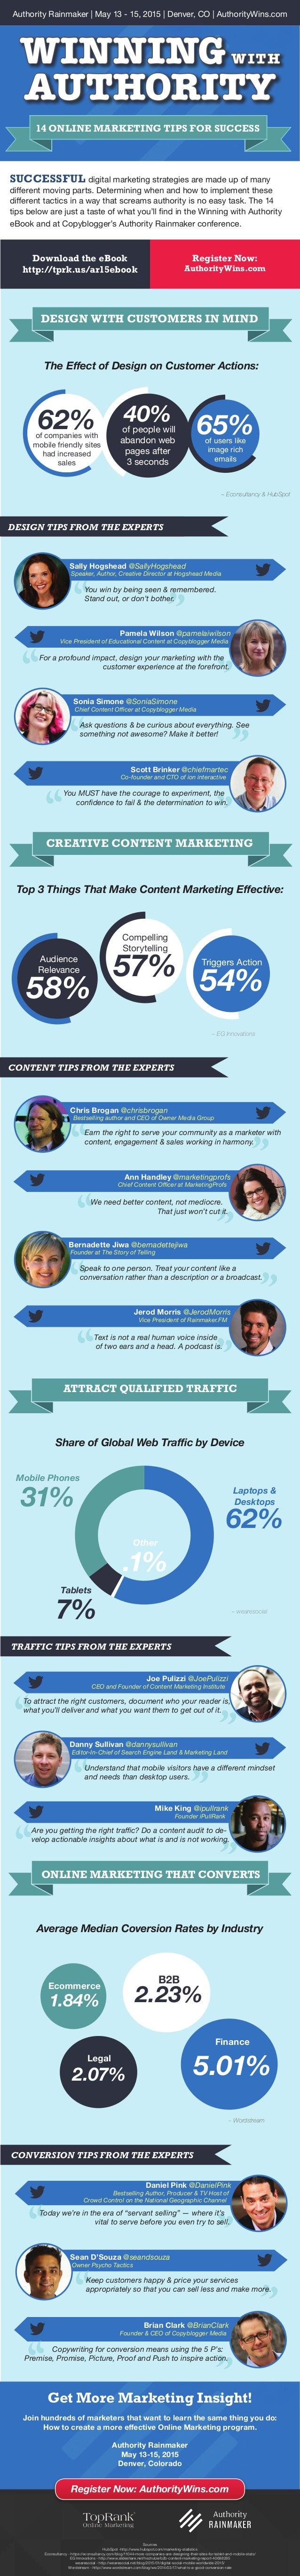 Online Marketing Infographic - Authority Rainmaker 2015